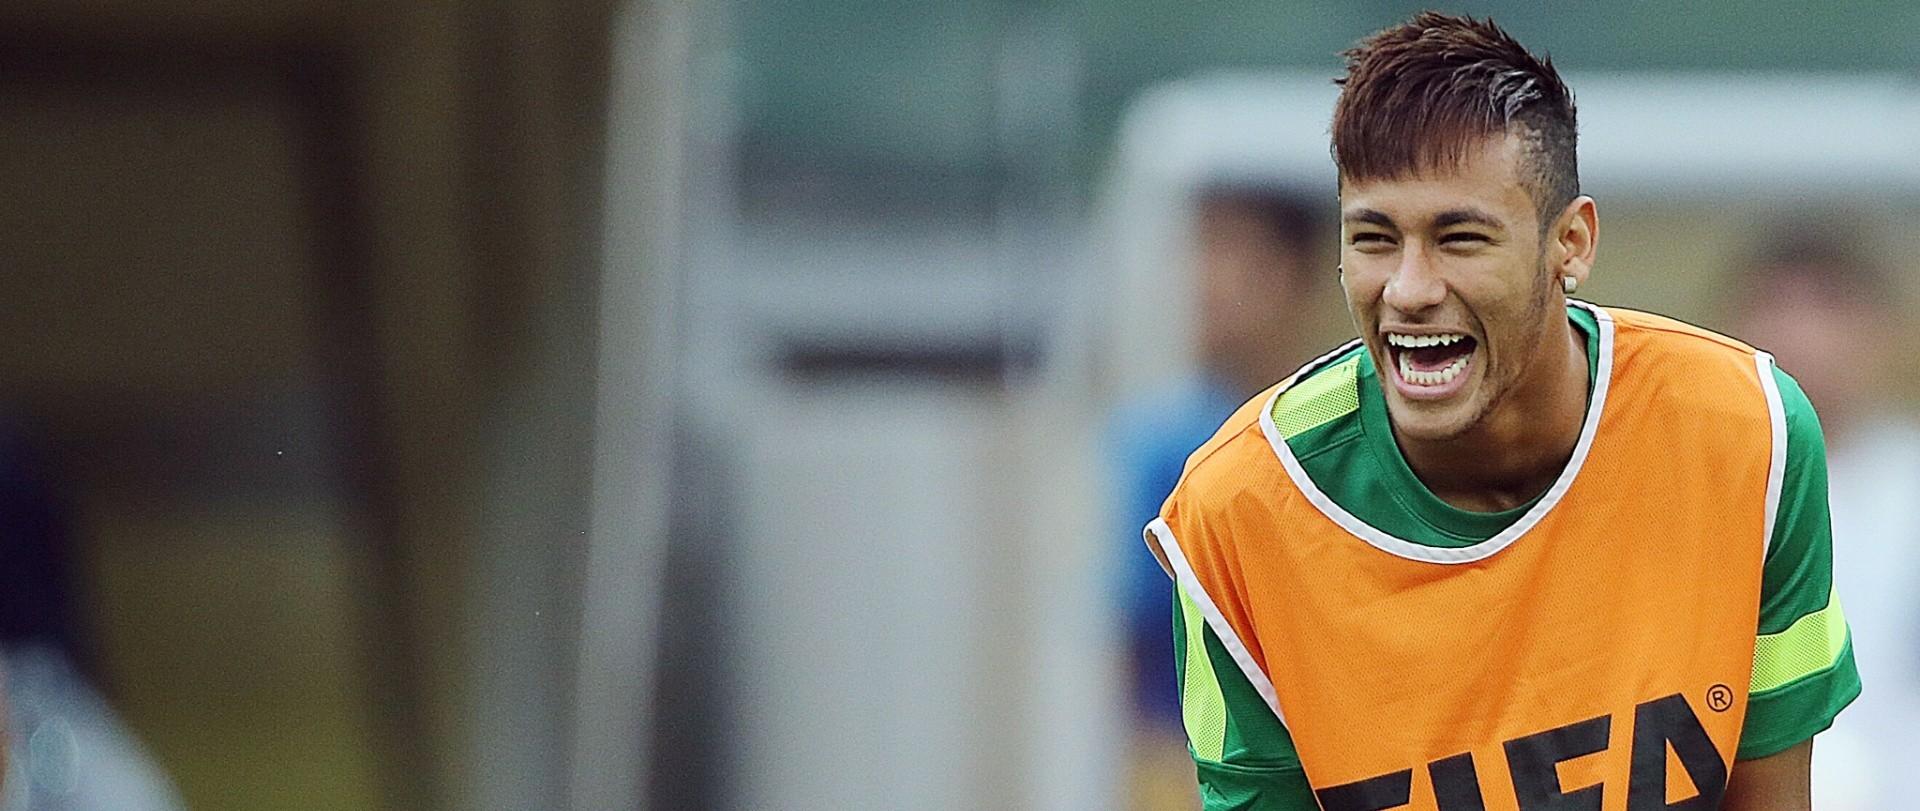 Soccer quotes tumblr neymar